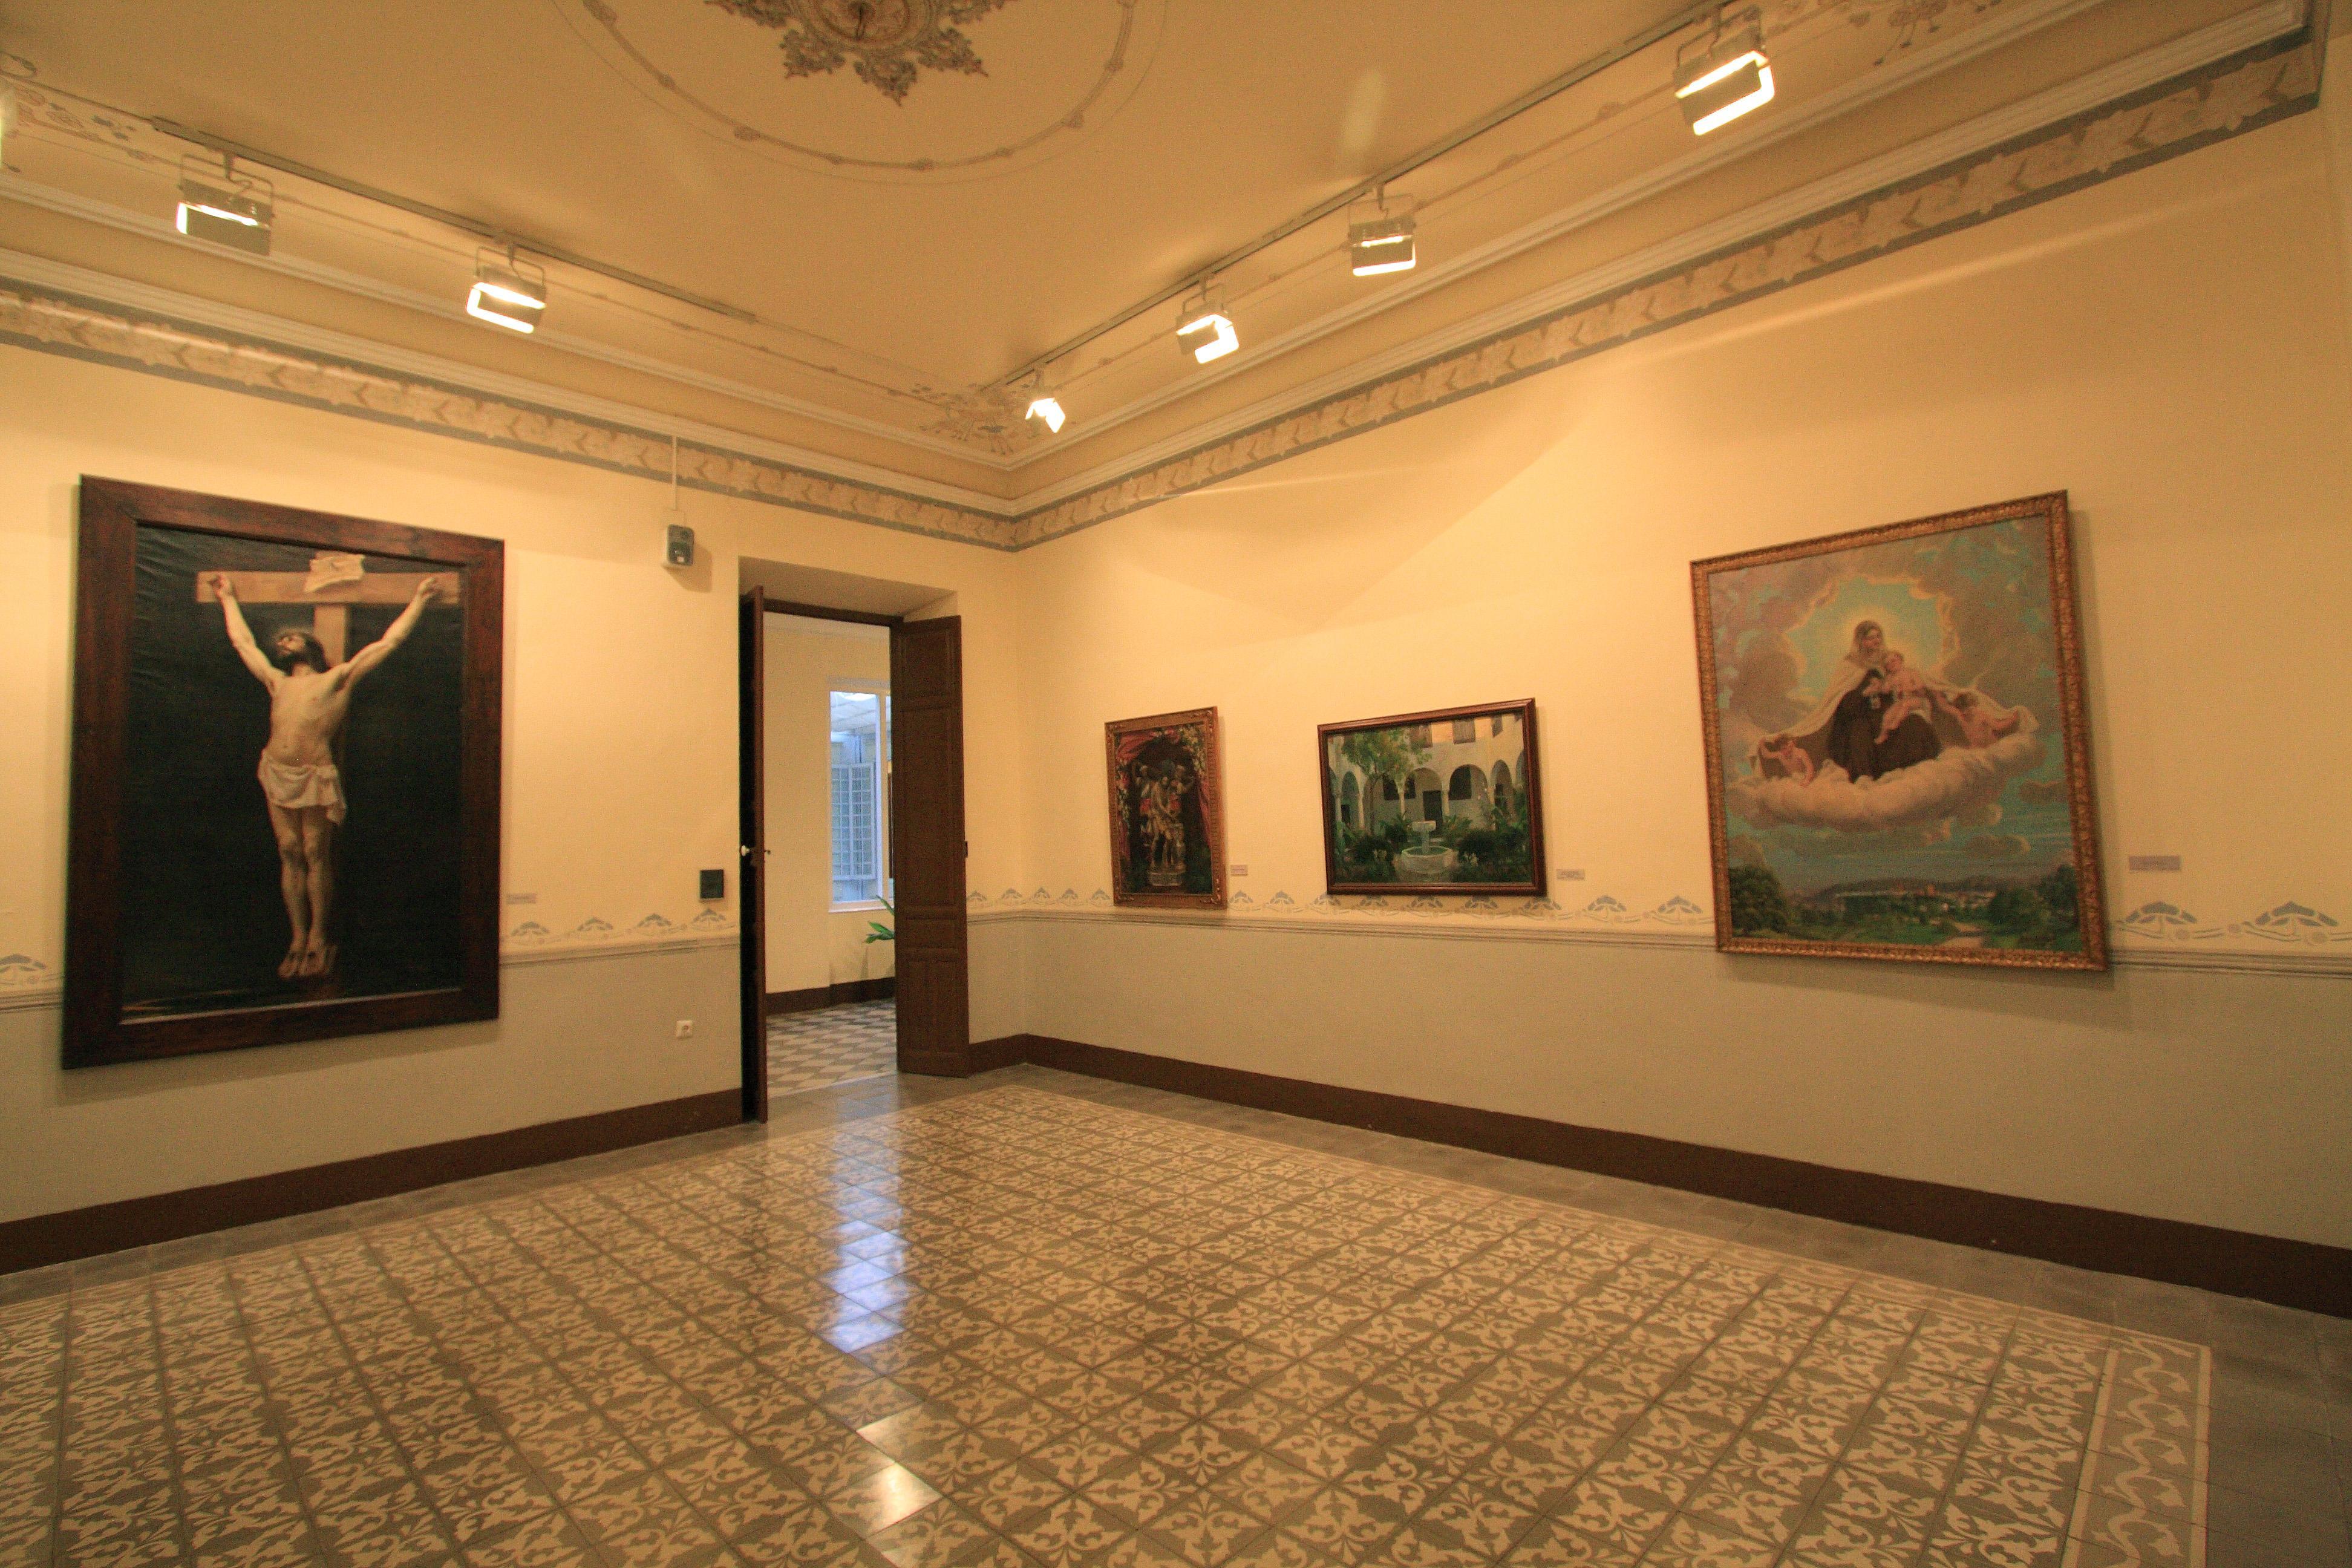 Museo Adolfo Lozano Sidro